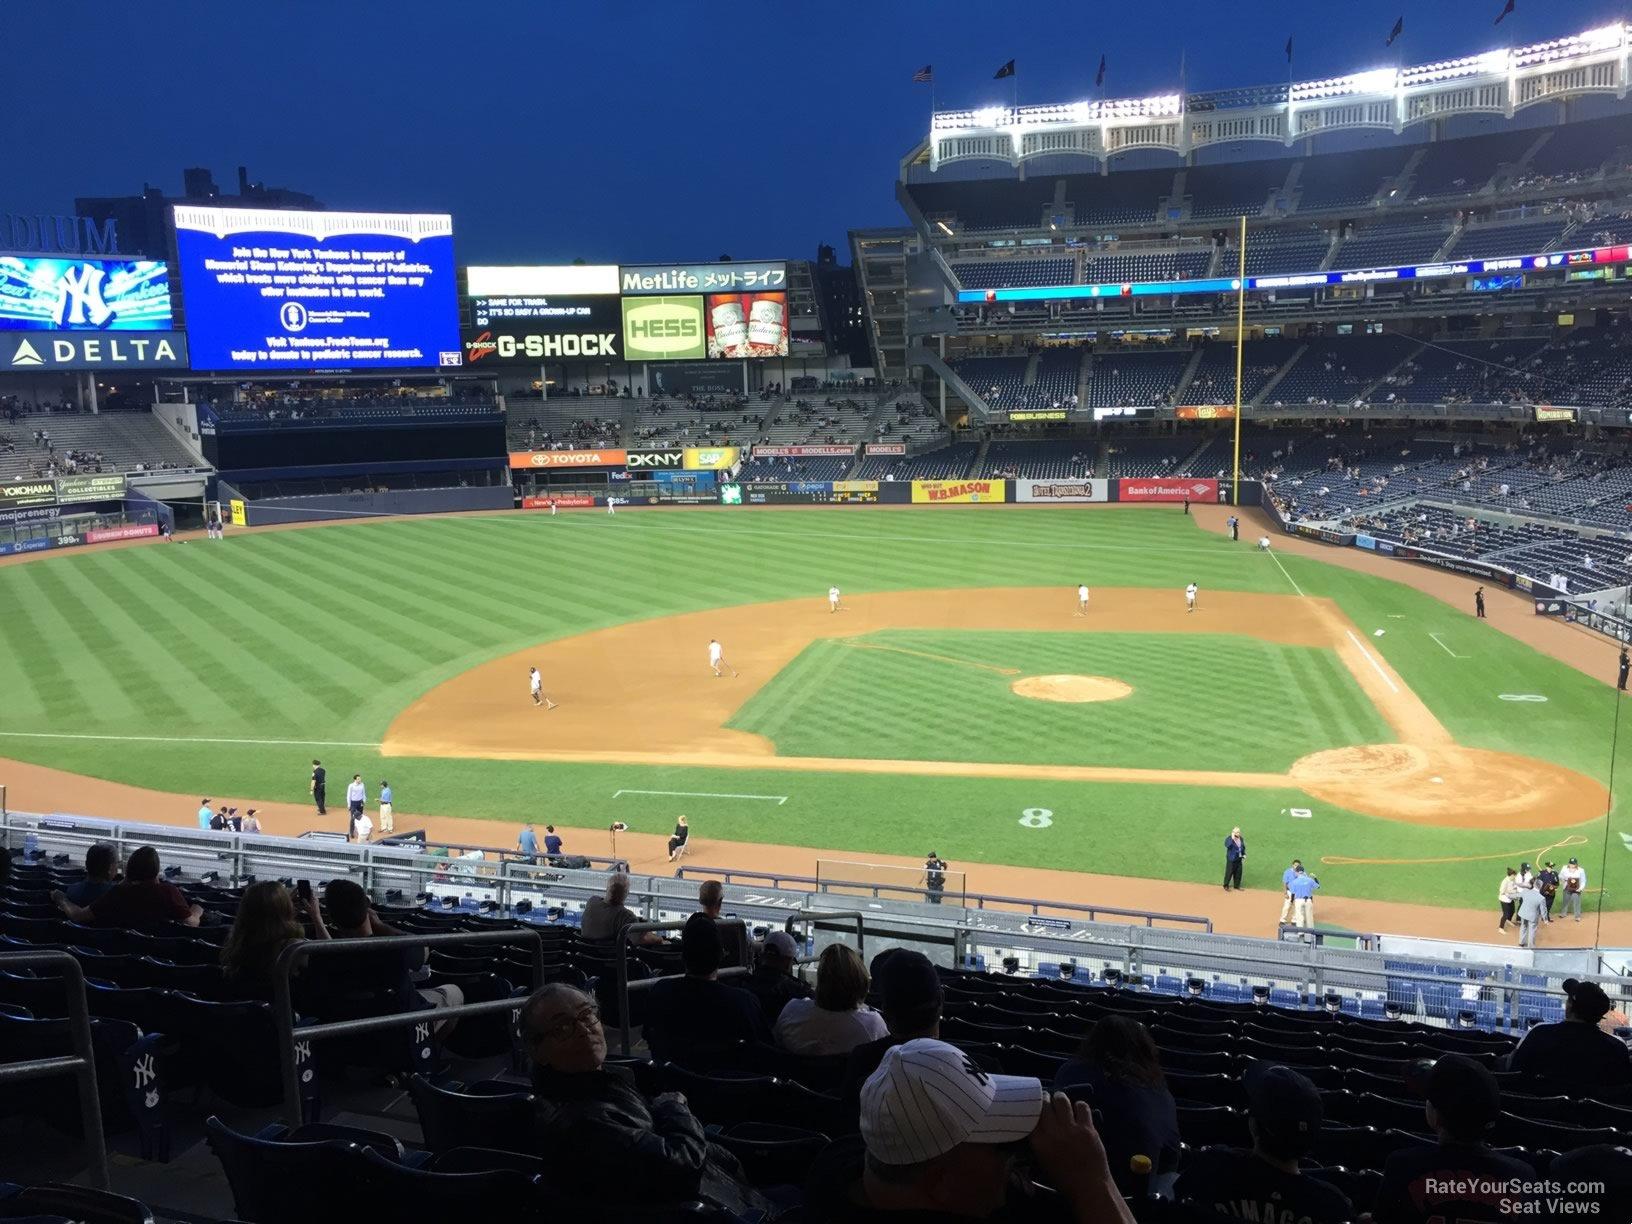 New York Yankees Seat View for Yankee Stadium Section 223